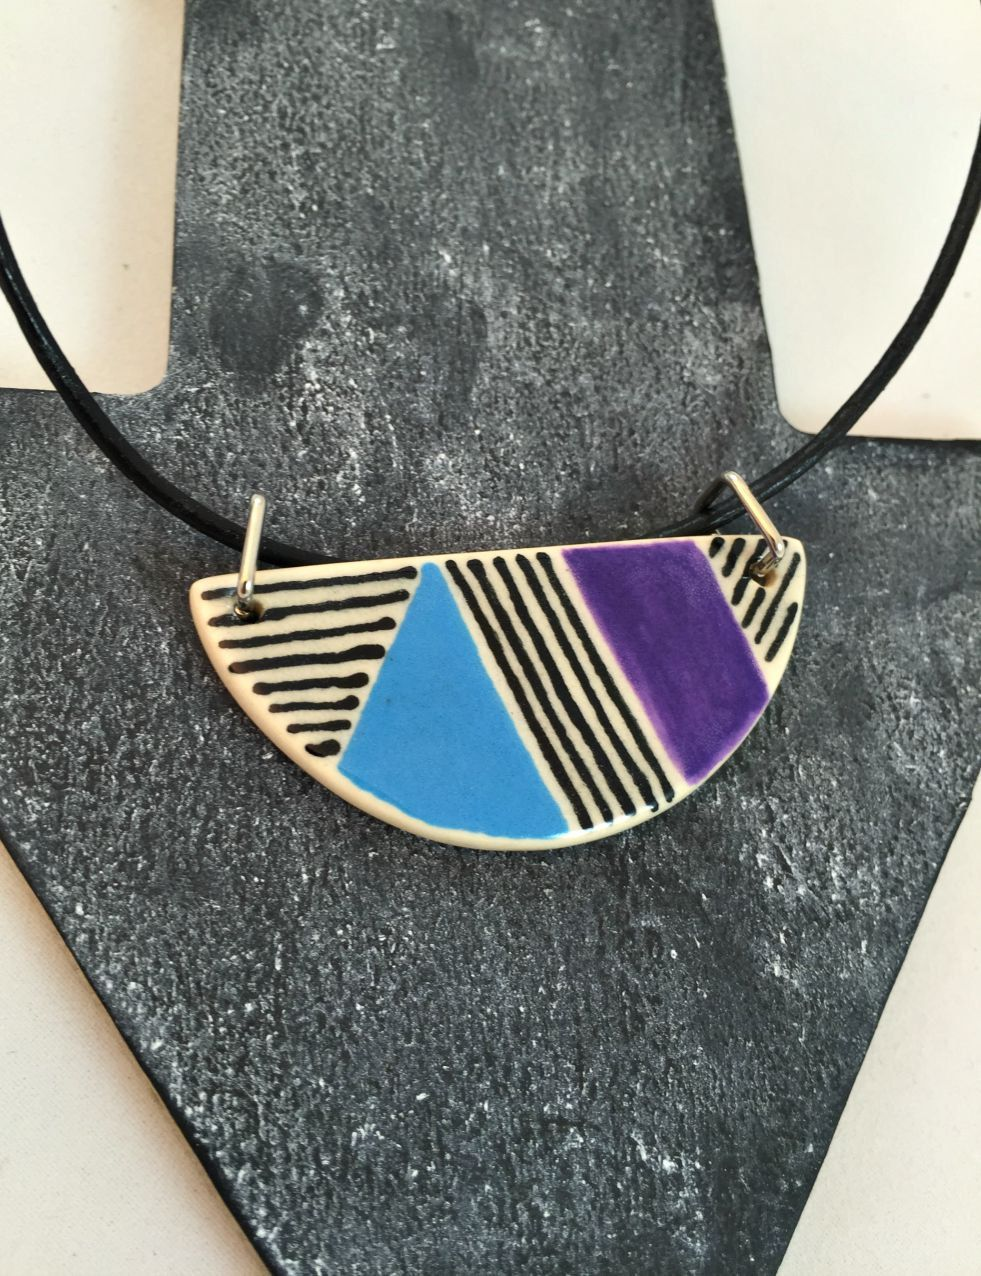 Black purple and blue geometric design on porcelain half